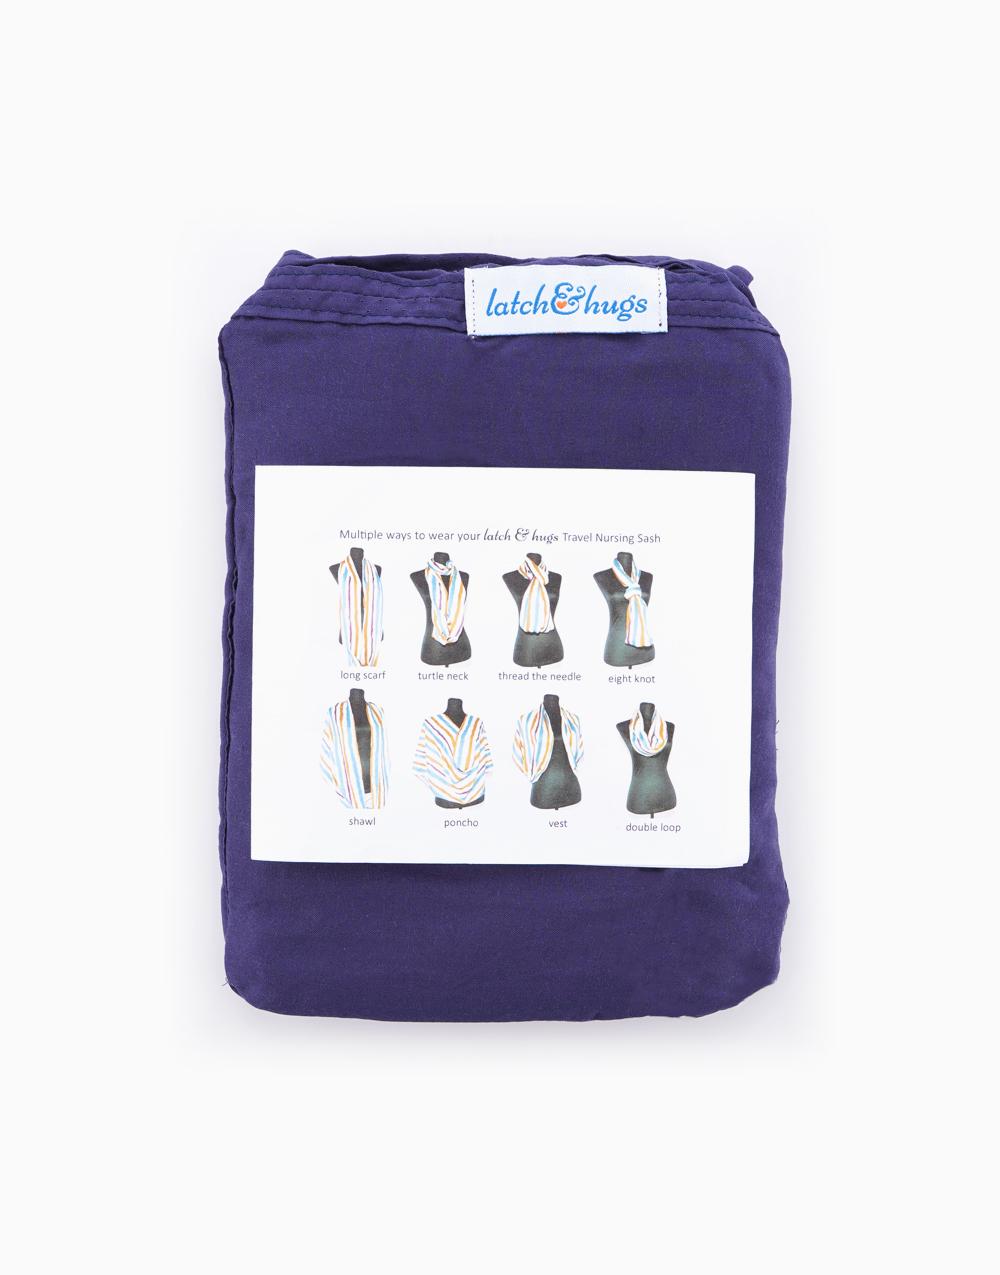 Latch & Hugs Nursing Sash (Bluish Gray) by Nanay At Ako